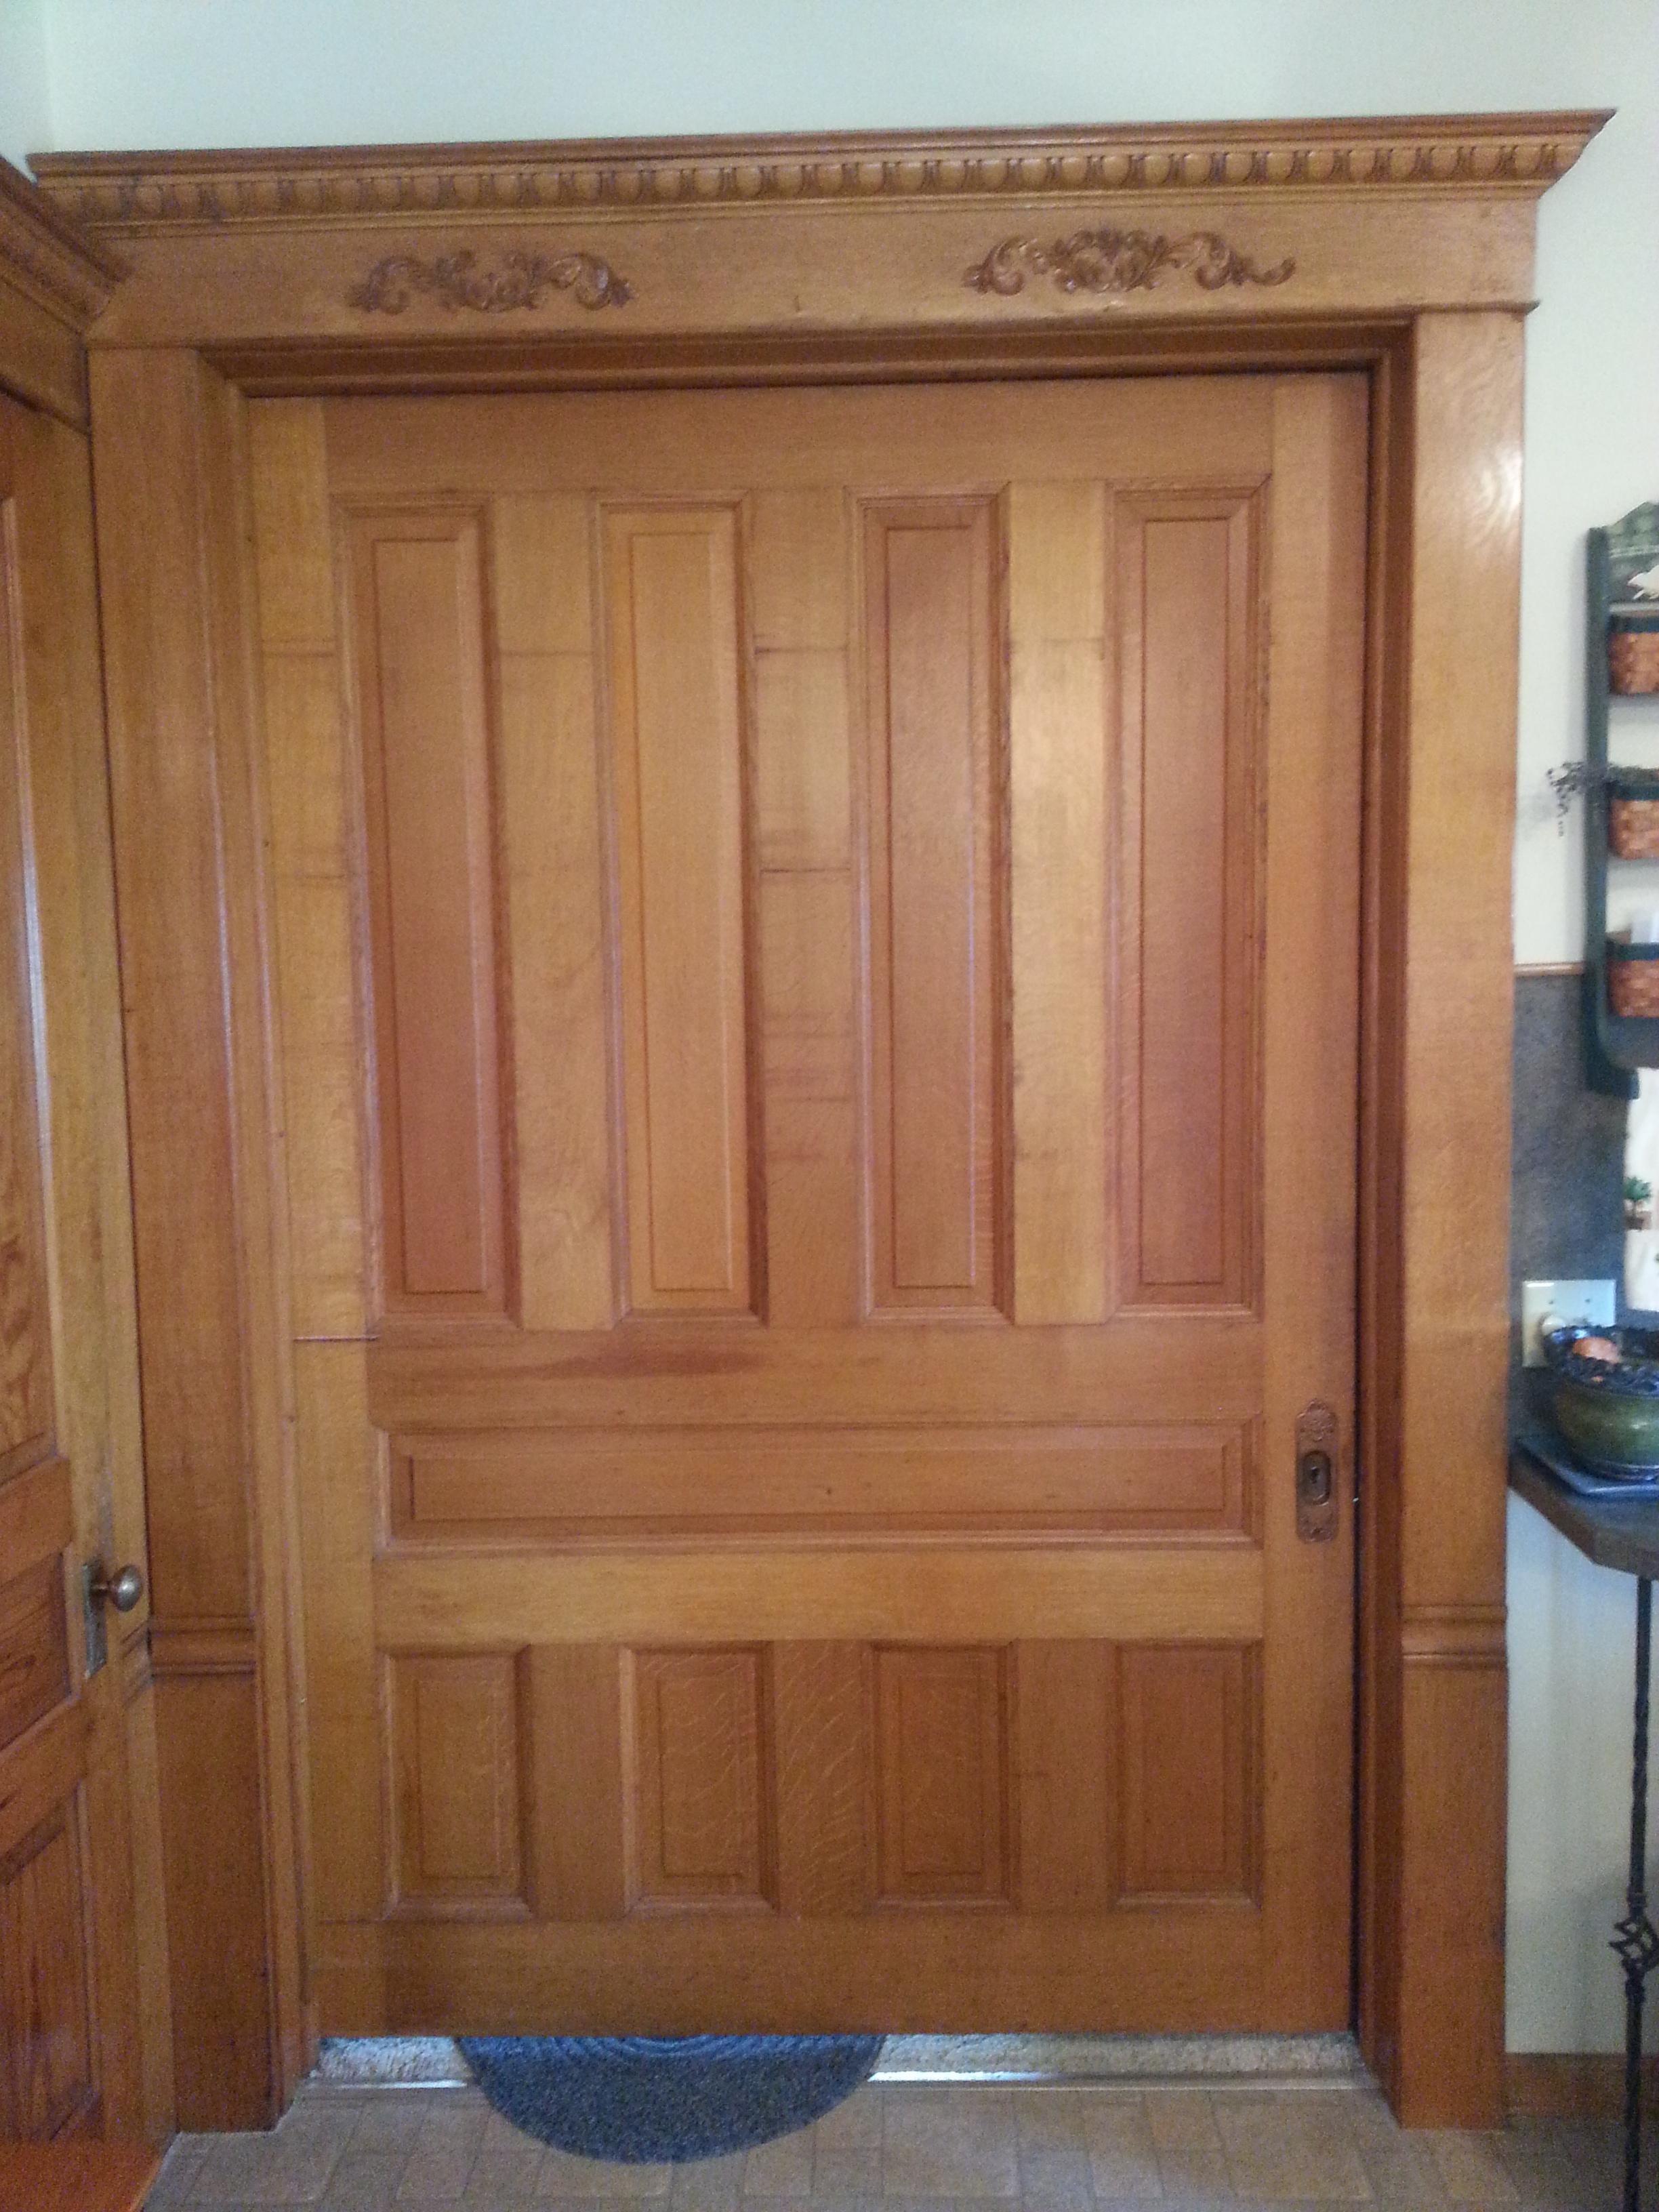 Imgur House Built Efficient Heating Craftsman Bungalows